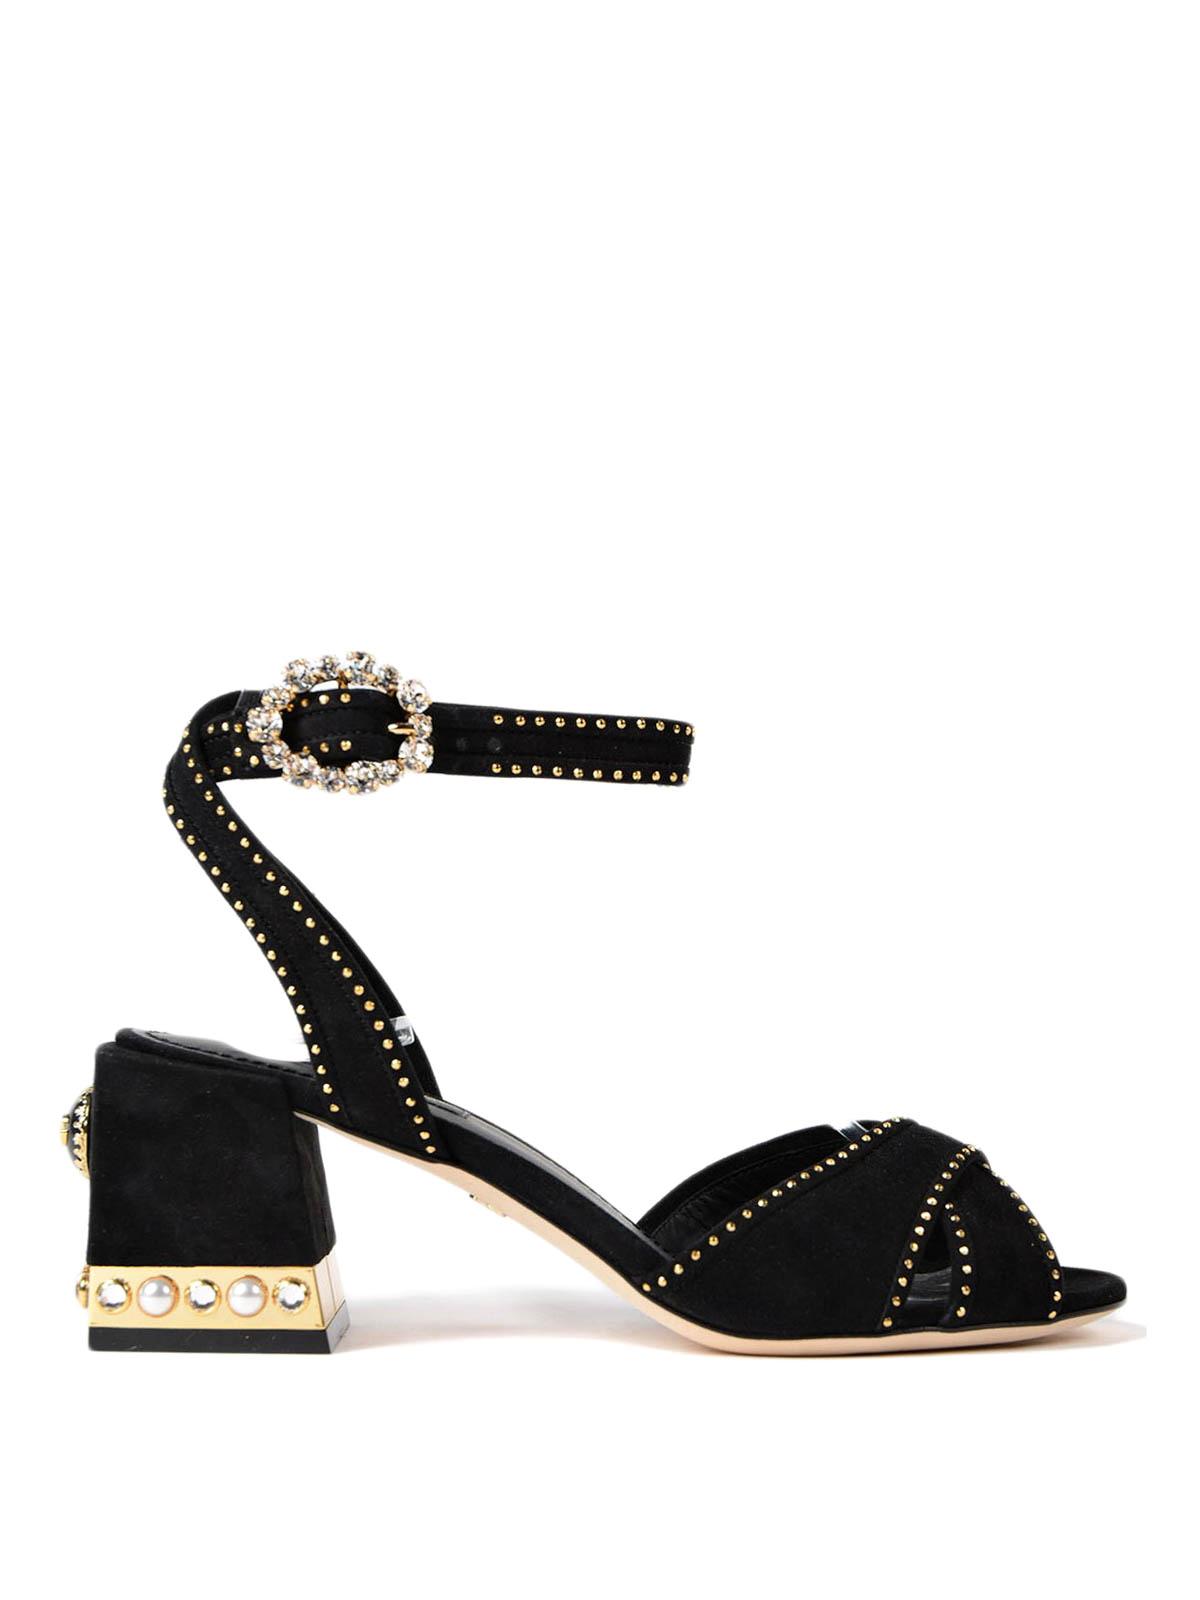 Keira amp; Cr0481an1498e831 Sandales Gabbana Dolce aPSwvvq